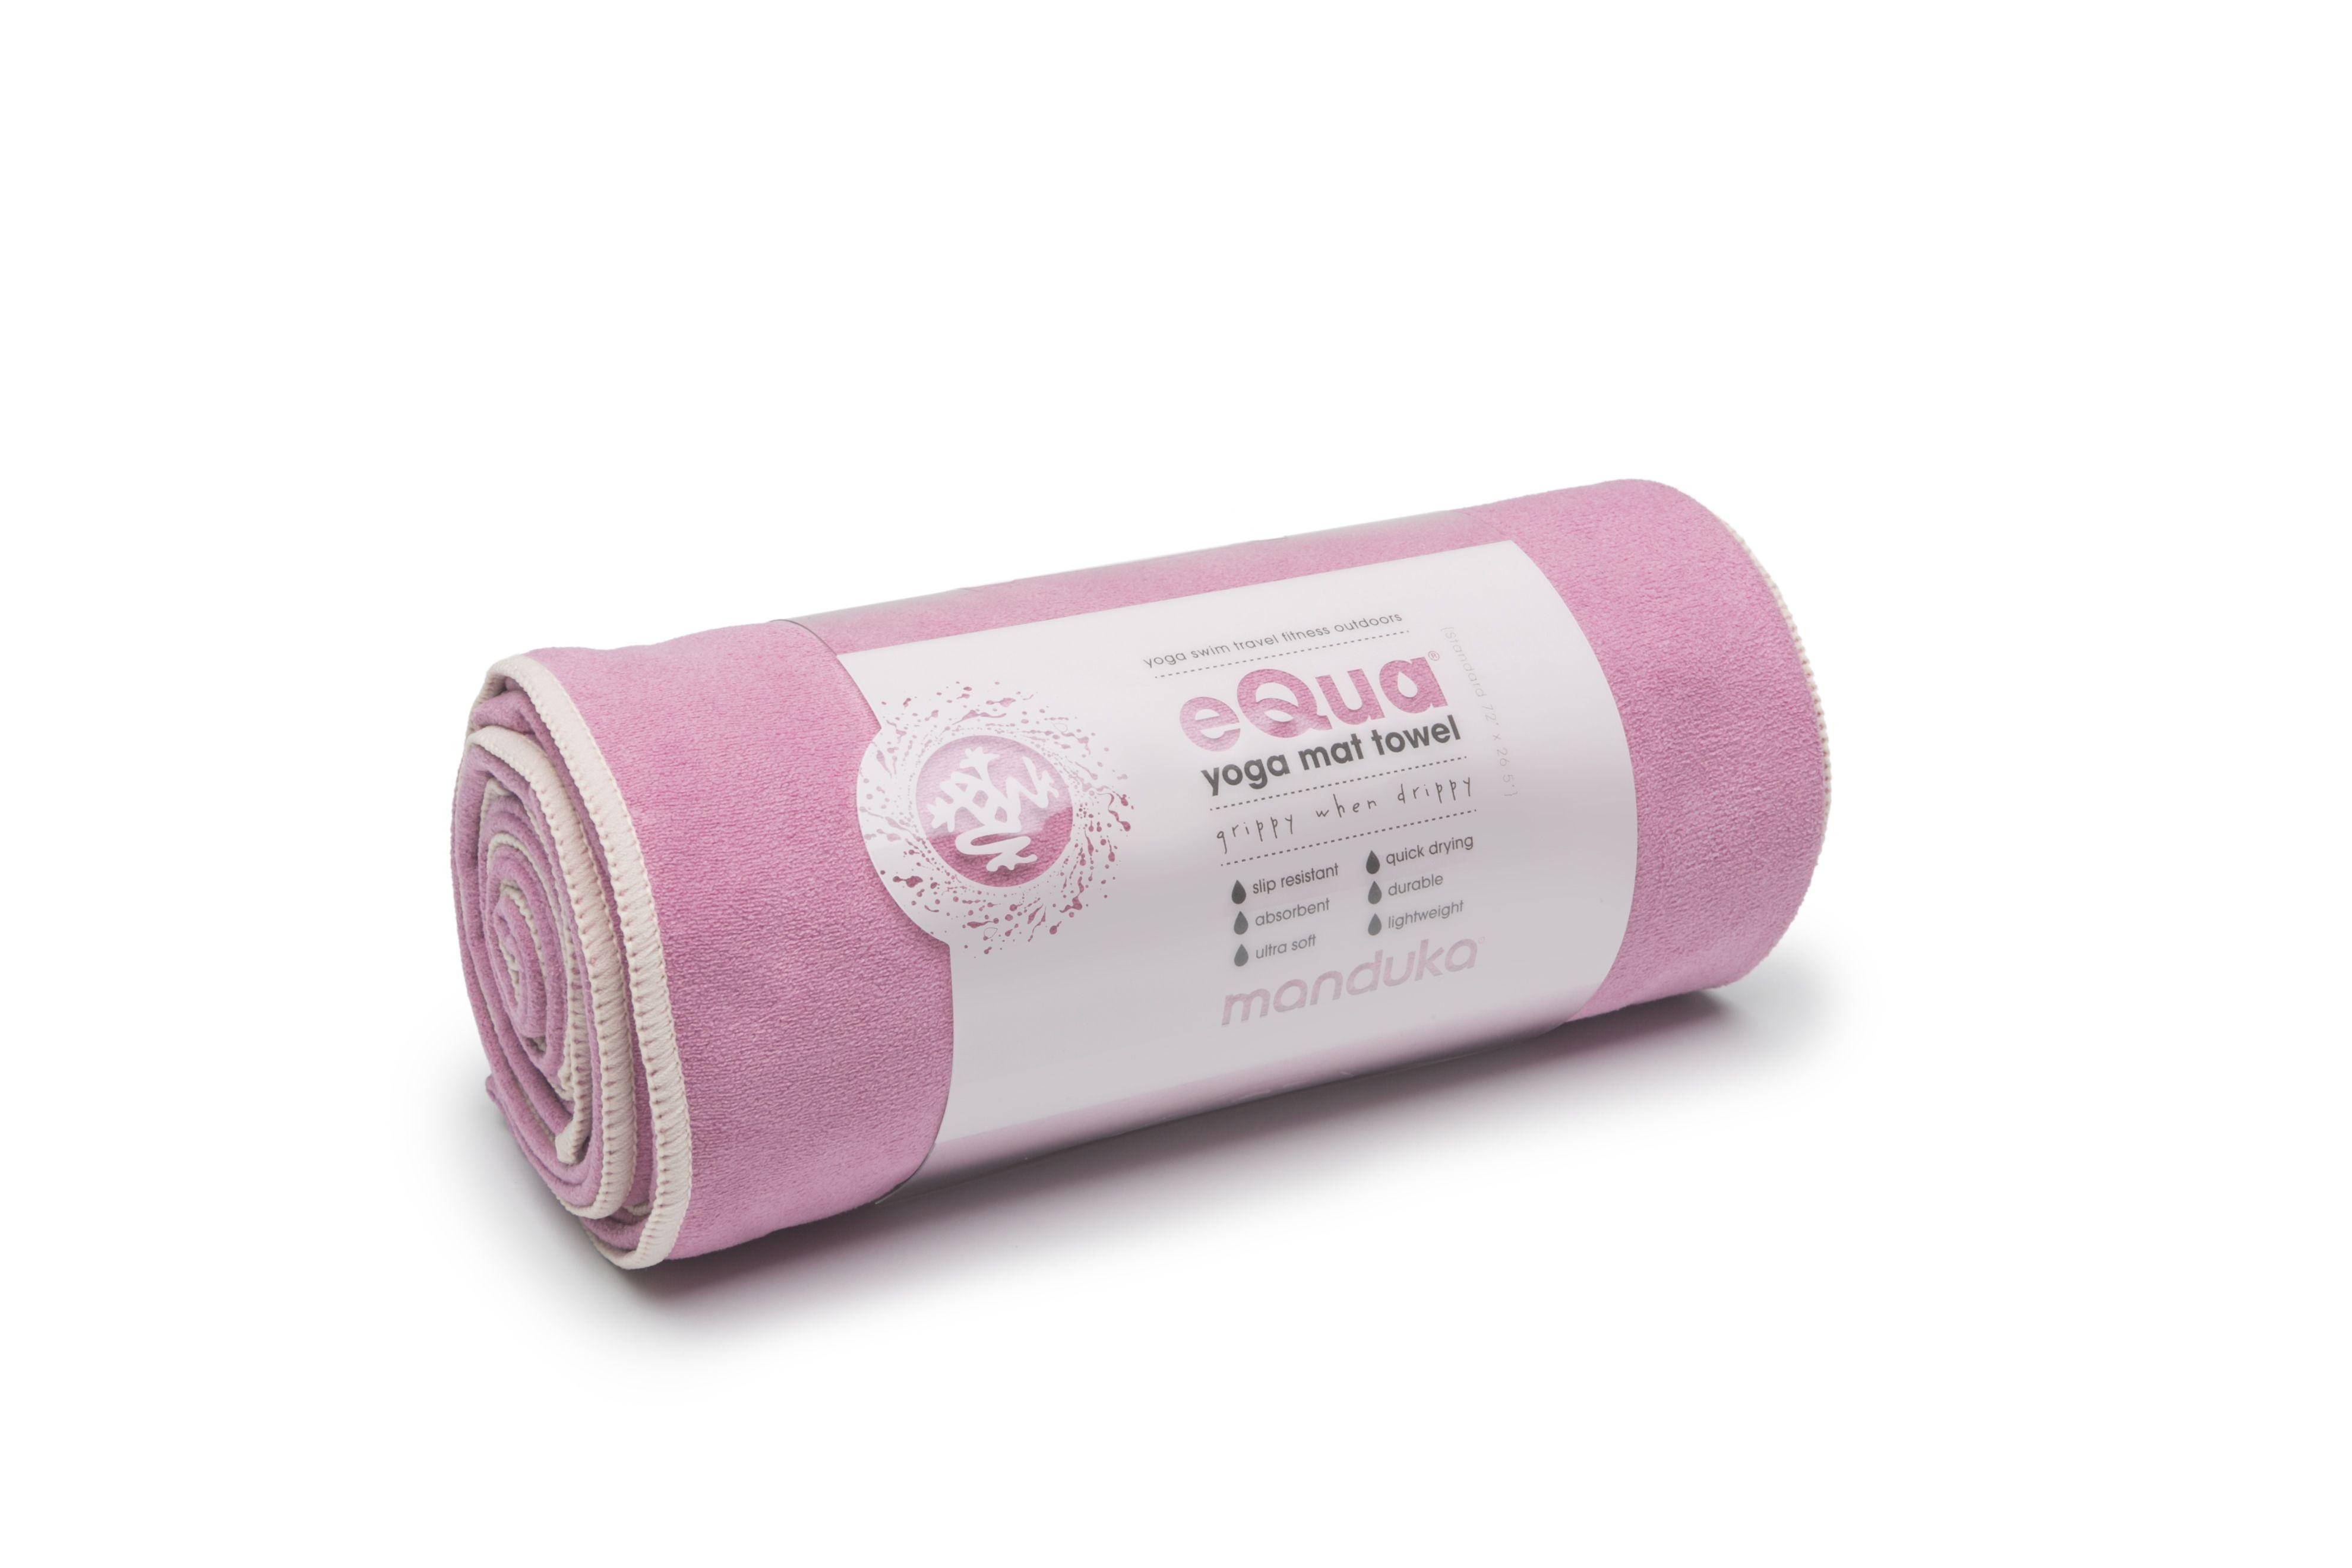 pm yoga grip athletika img towel mats mat towels ultra file fl